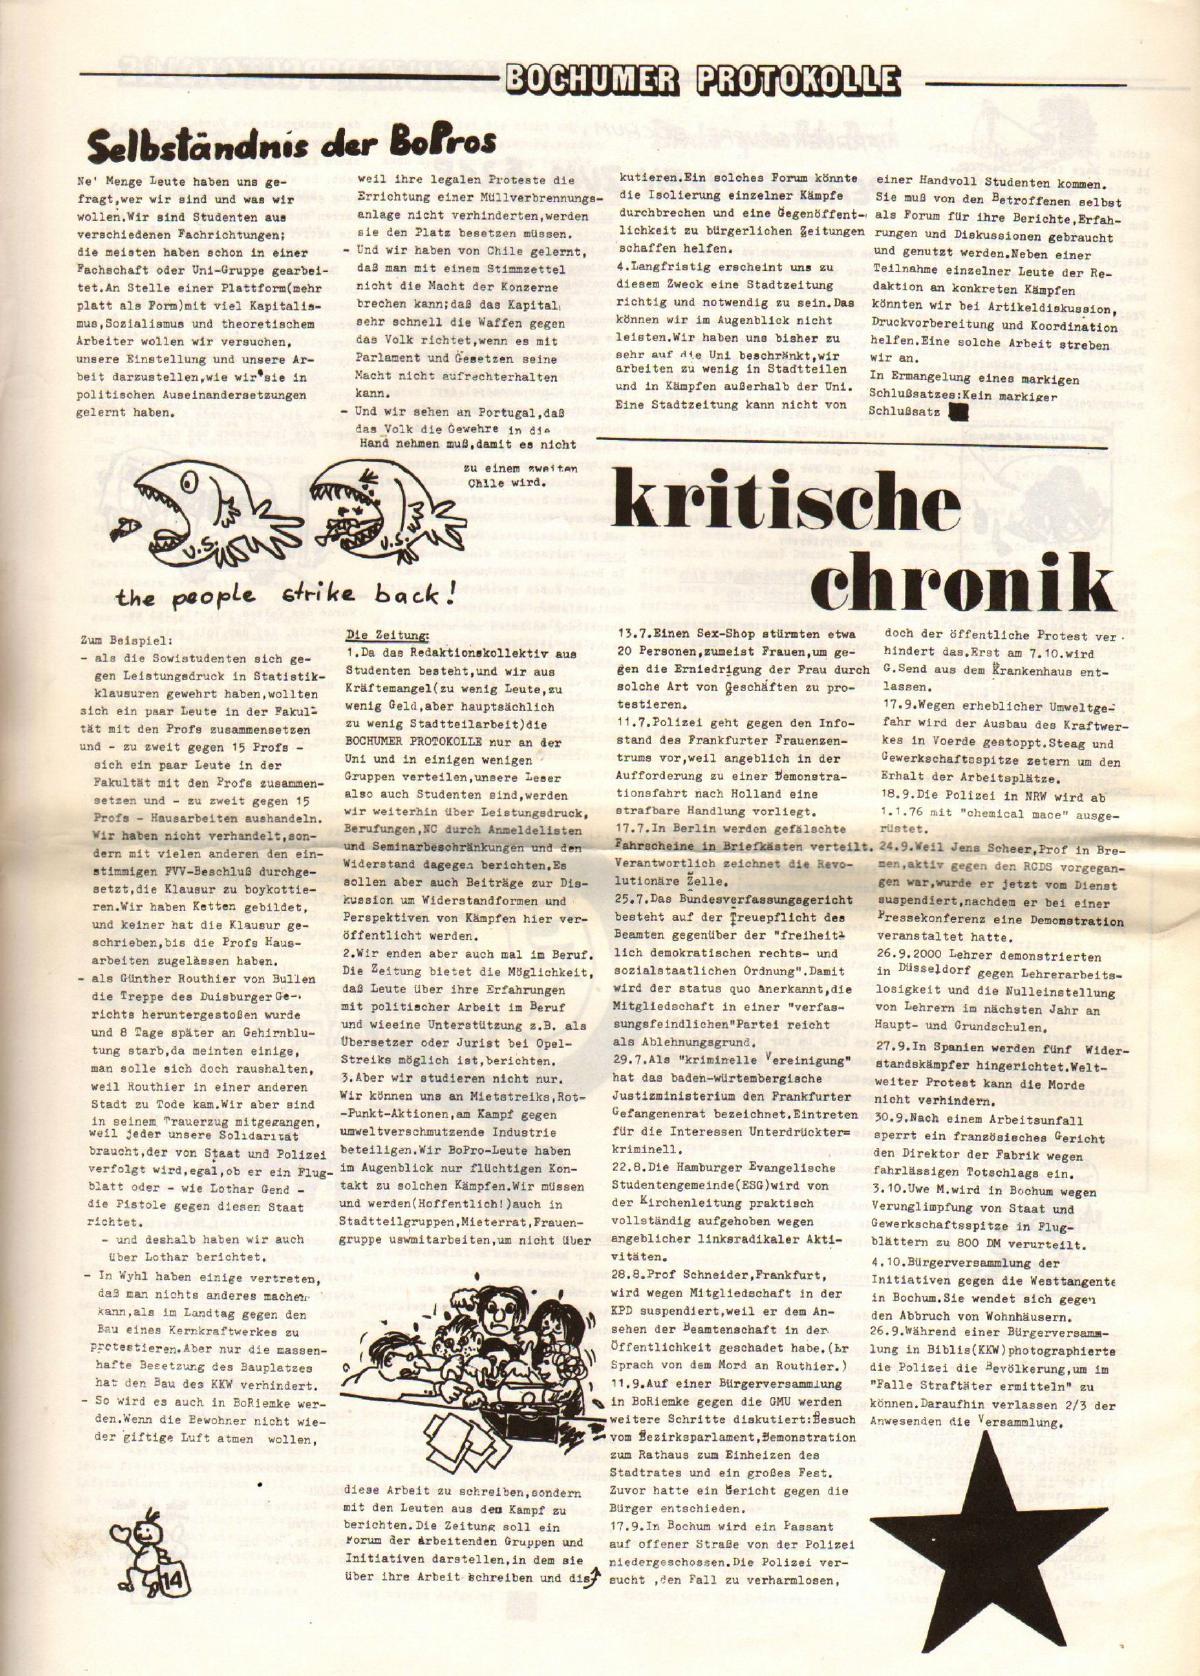 Bochumer_Protokolle_19751000_014